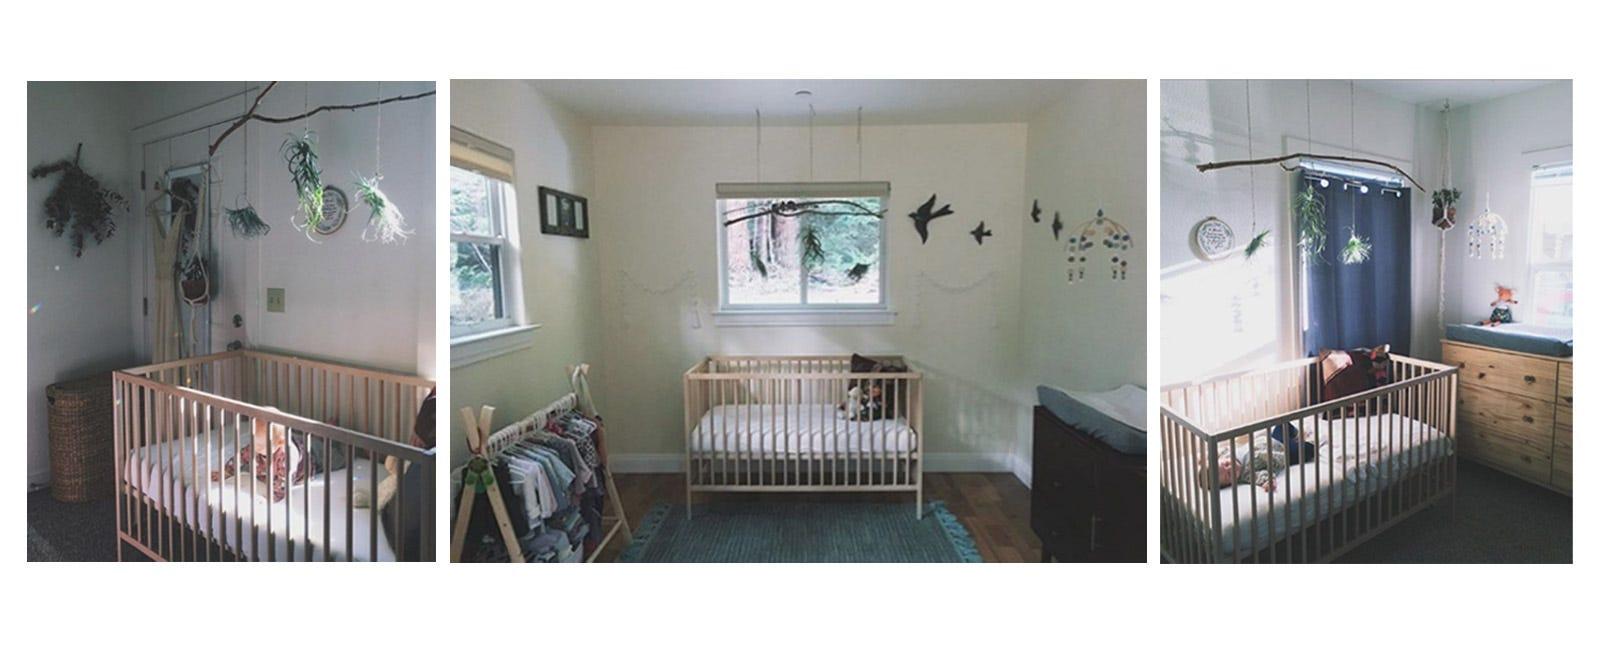 Organic Crib Mattress